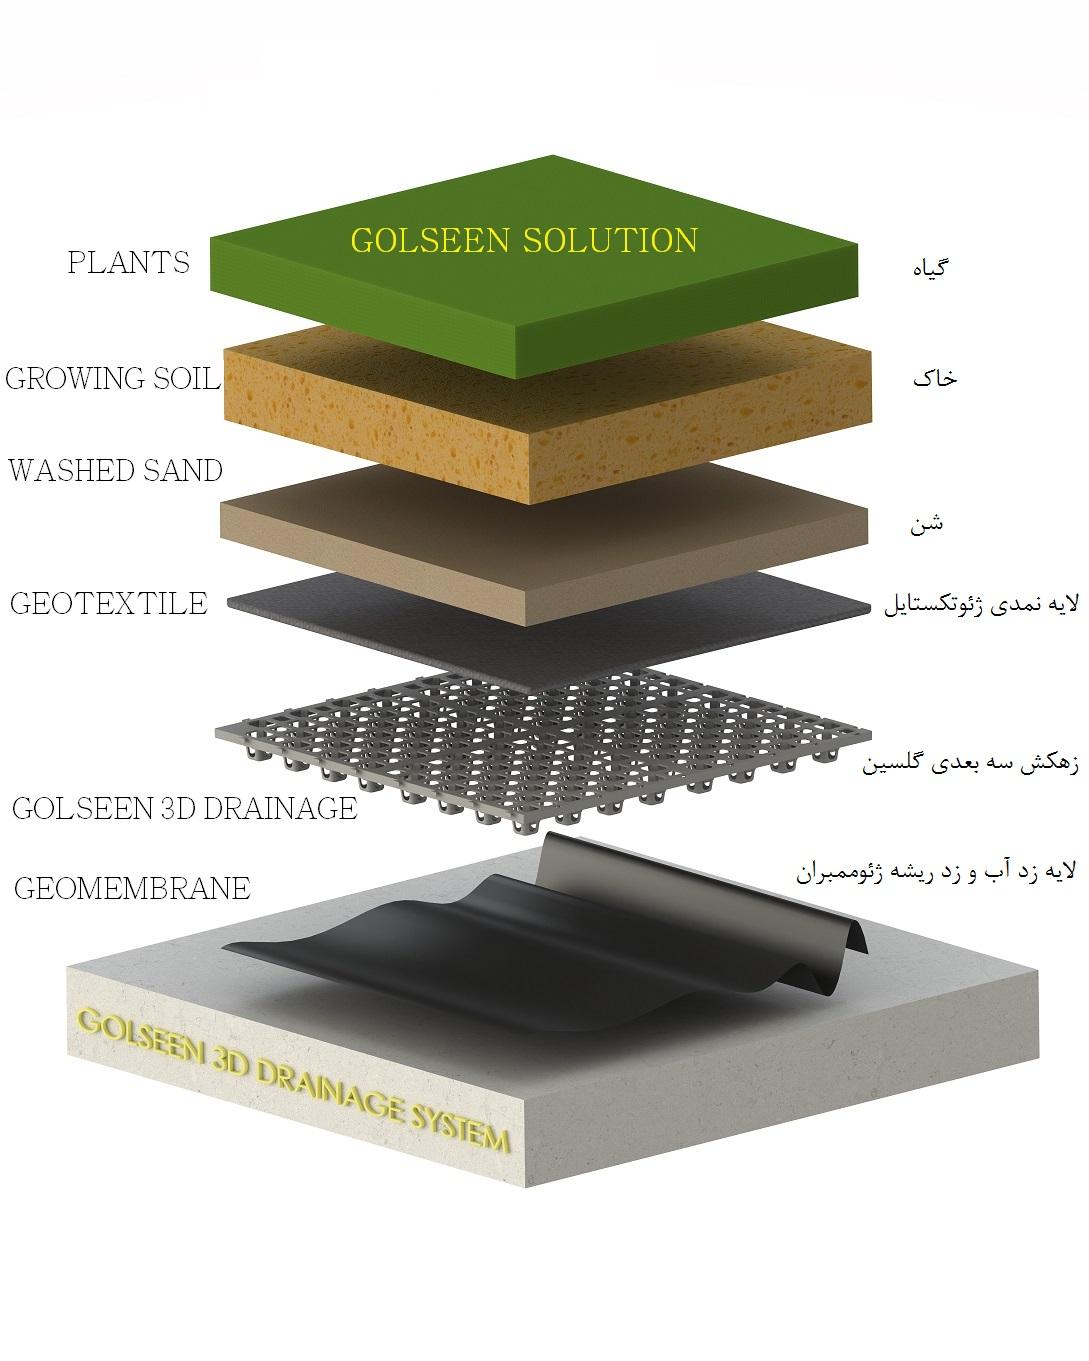 3D дренажа Производитель-3D дренажа-مصنع الصرف 3D-تصريف 3D ثلاثي الأبعاد-Dîwarê 3D-3D დრენაჟი- 3D drenaj-3D drenaj üreticisi زهکش سه بعدی